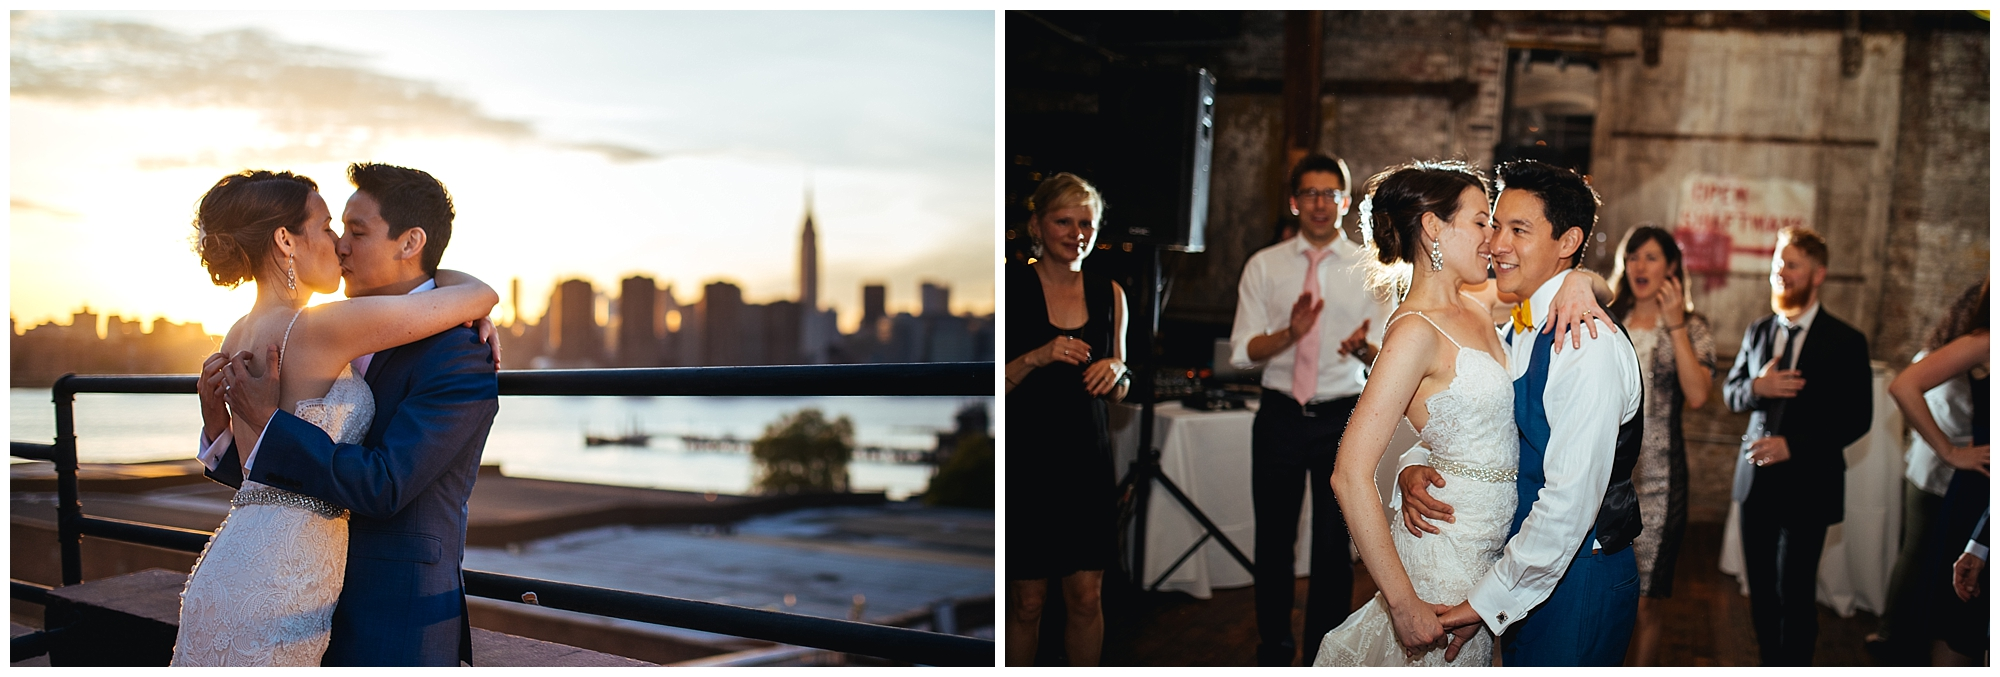 NYC-Wedding-Photographer32.jpg